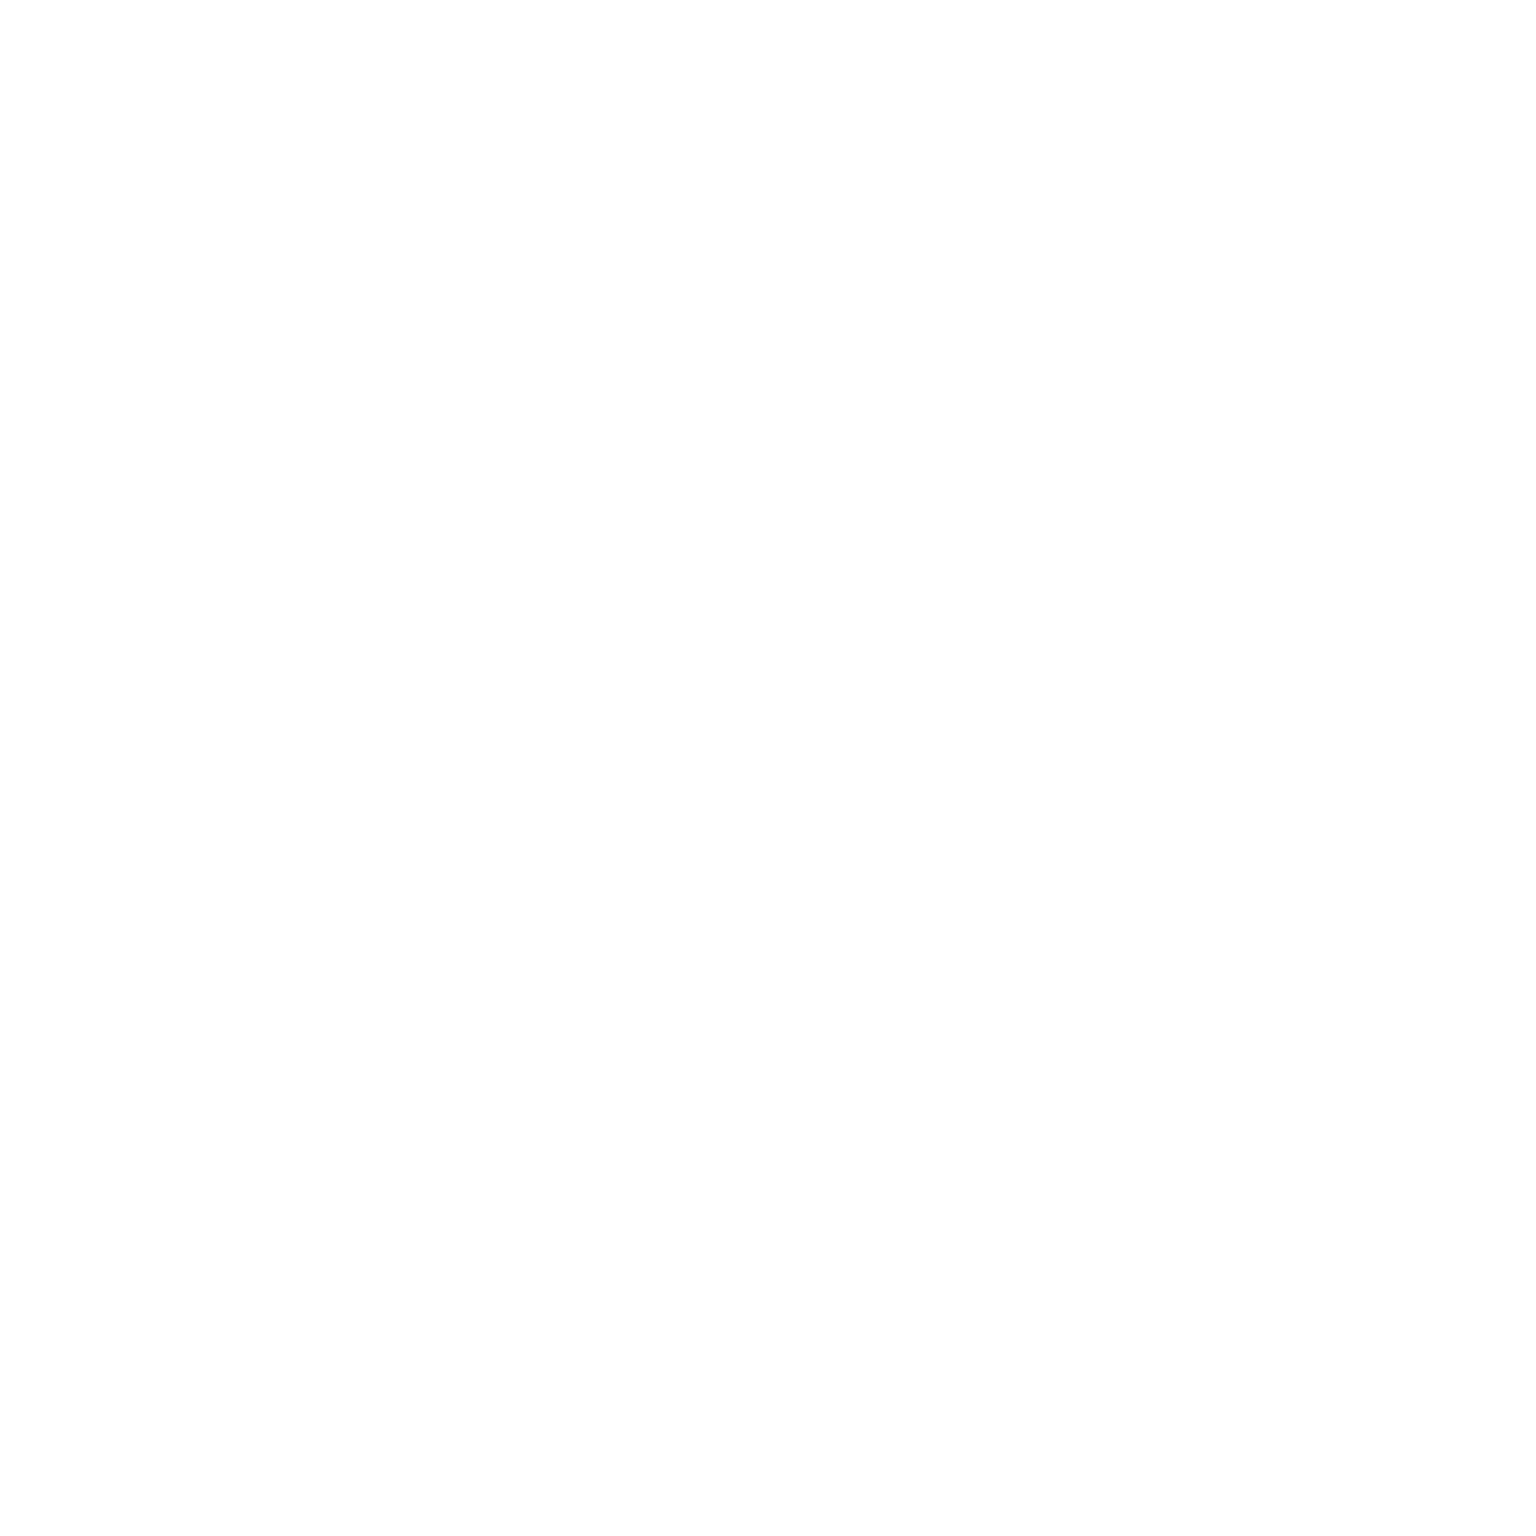 Hiboost-Affilicate-Register-Account